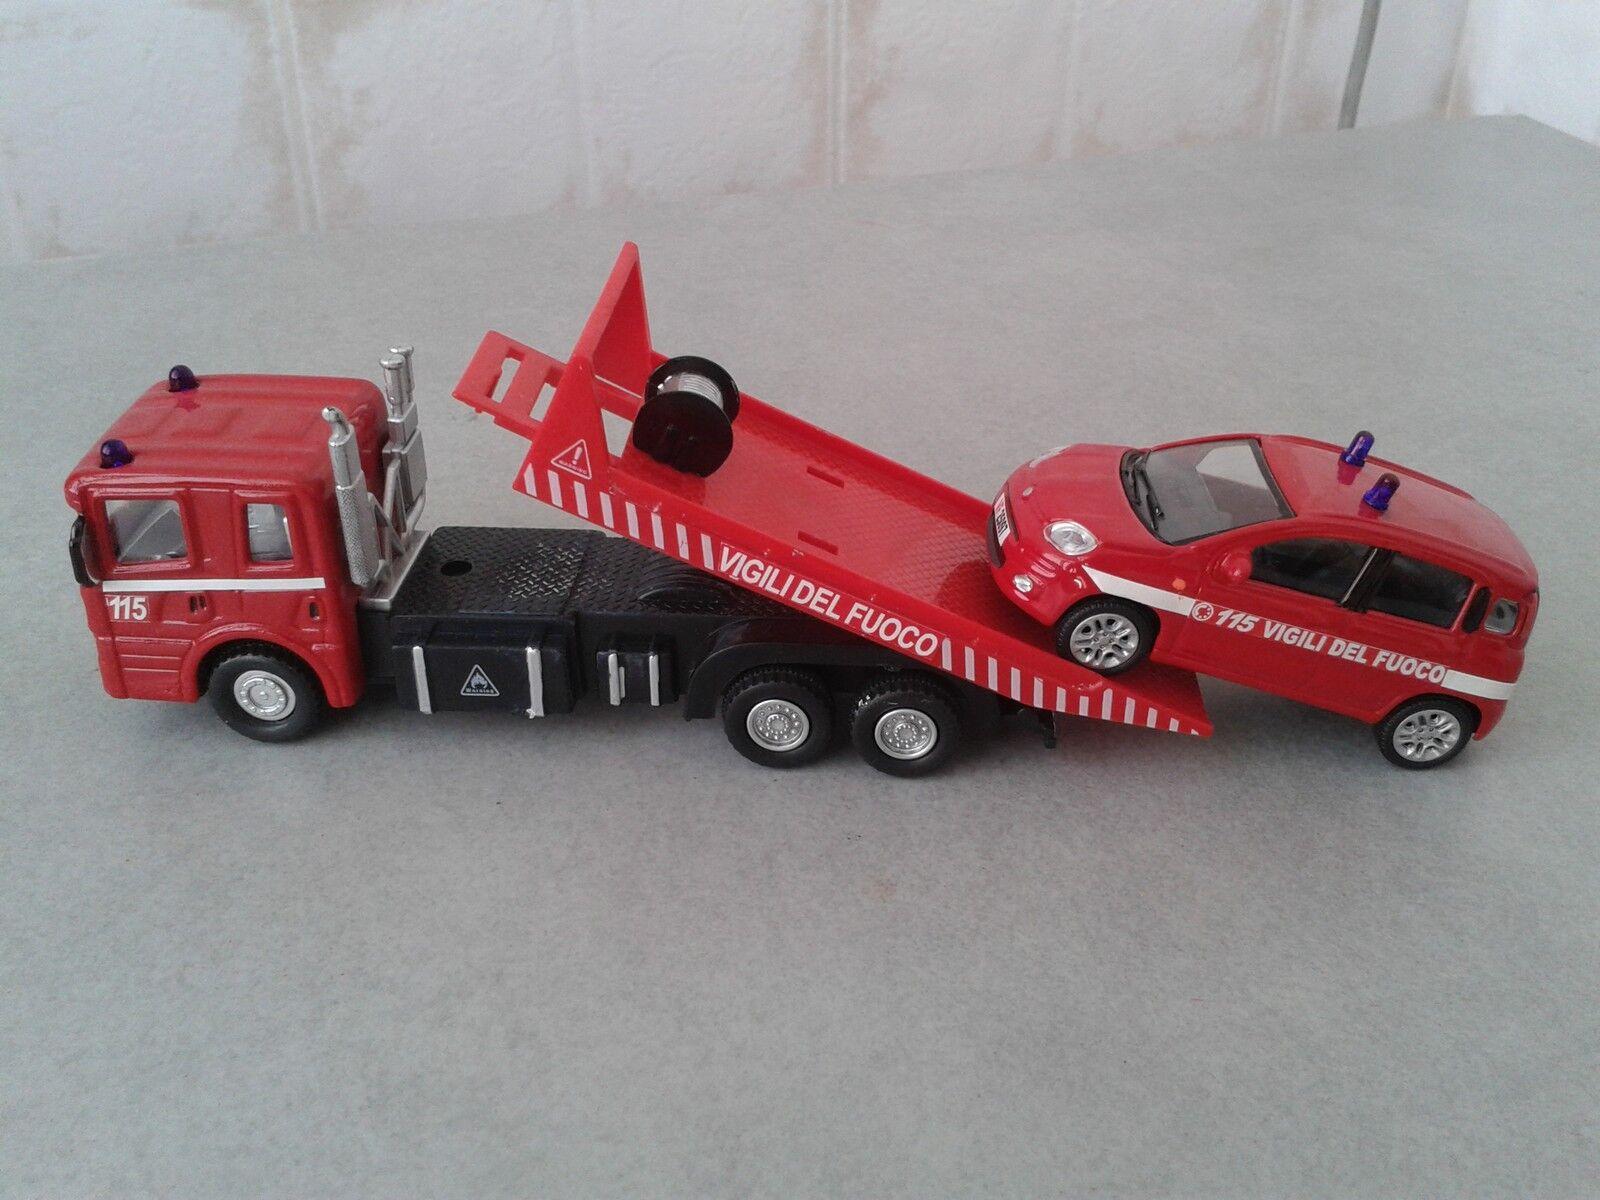 VIGILI DEL FUOCO -POMPIERI -POMPIERI -POMPIERI -FIRE ENGINE- CARRO ATTREZZI  FIAT PANDA 1 43 - 7abfec